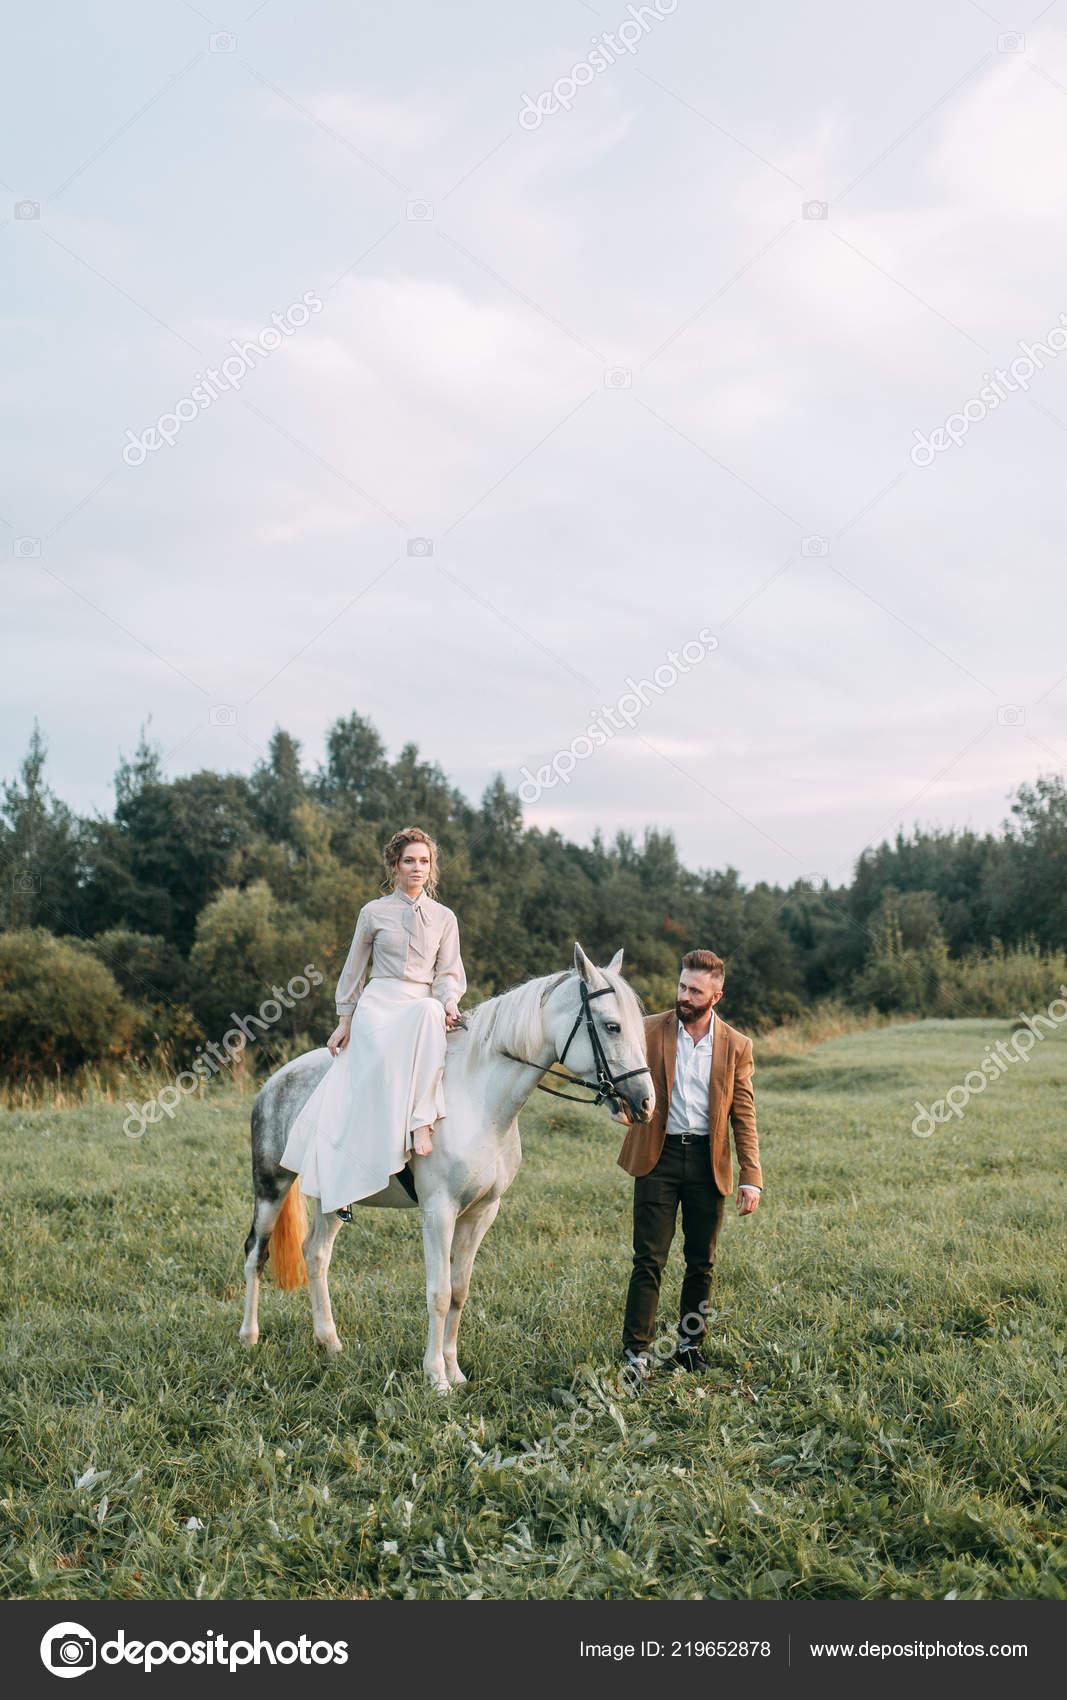 Wedding American Style Ranch Horse Walk Couples Fields Sunset Friends Stock Photo C Pavelvozmischev 219652878